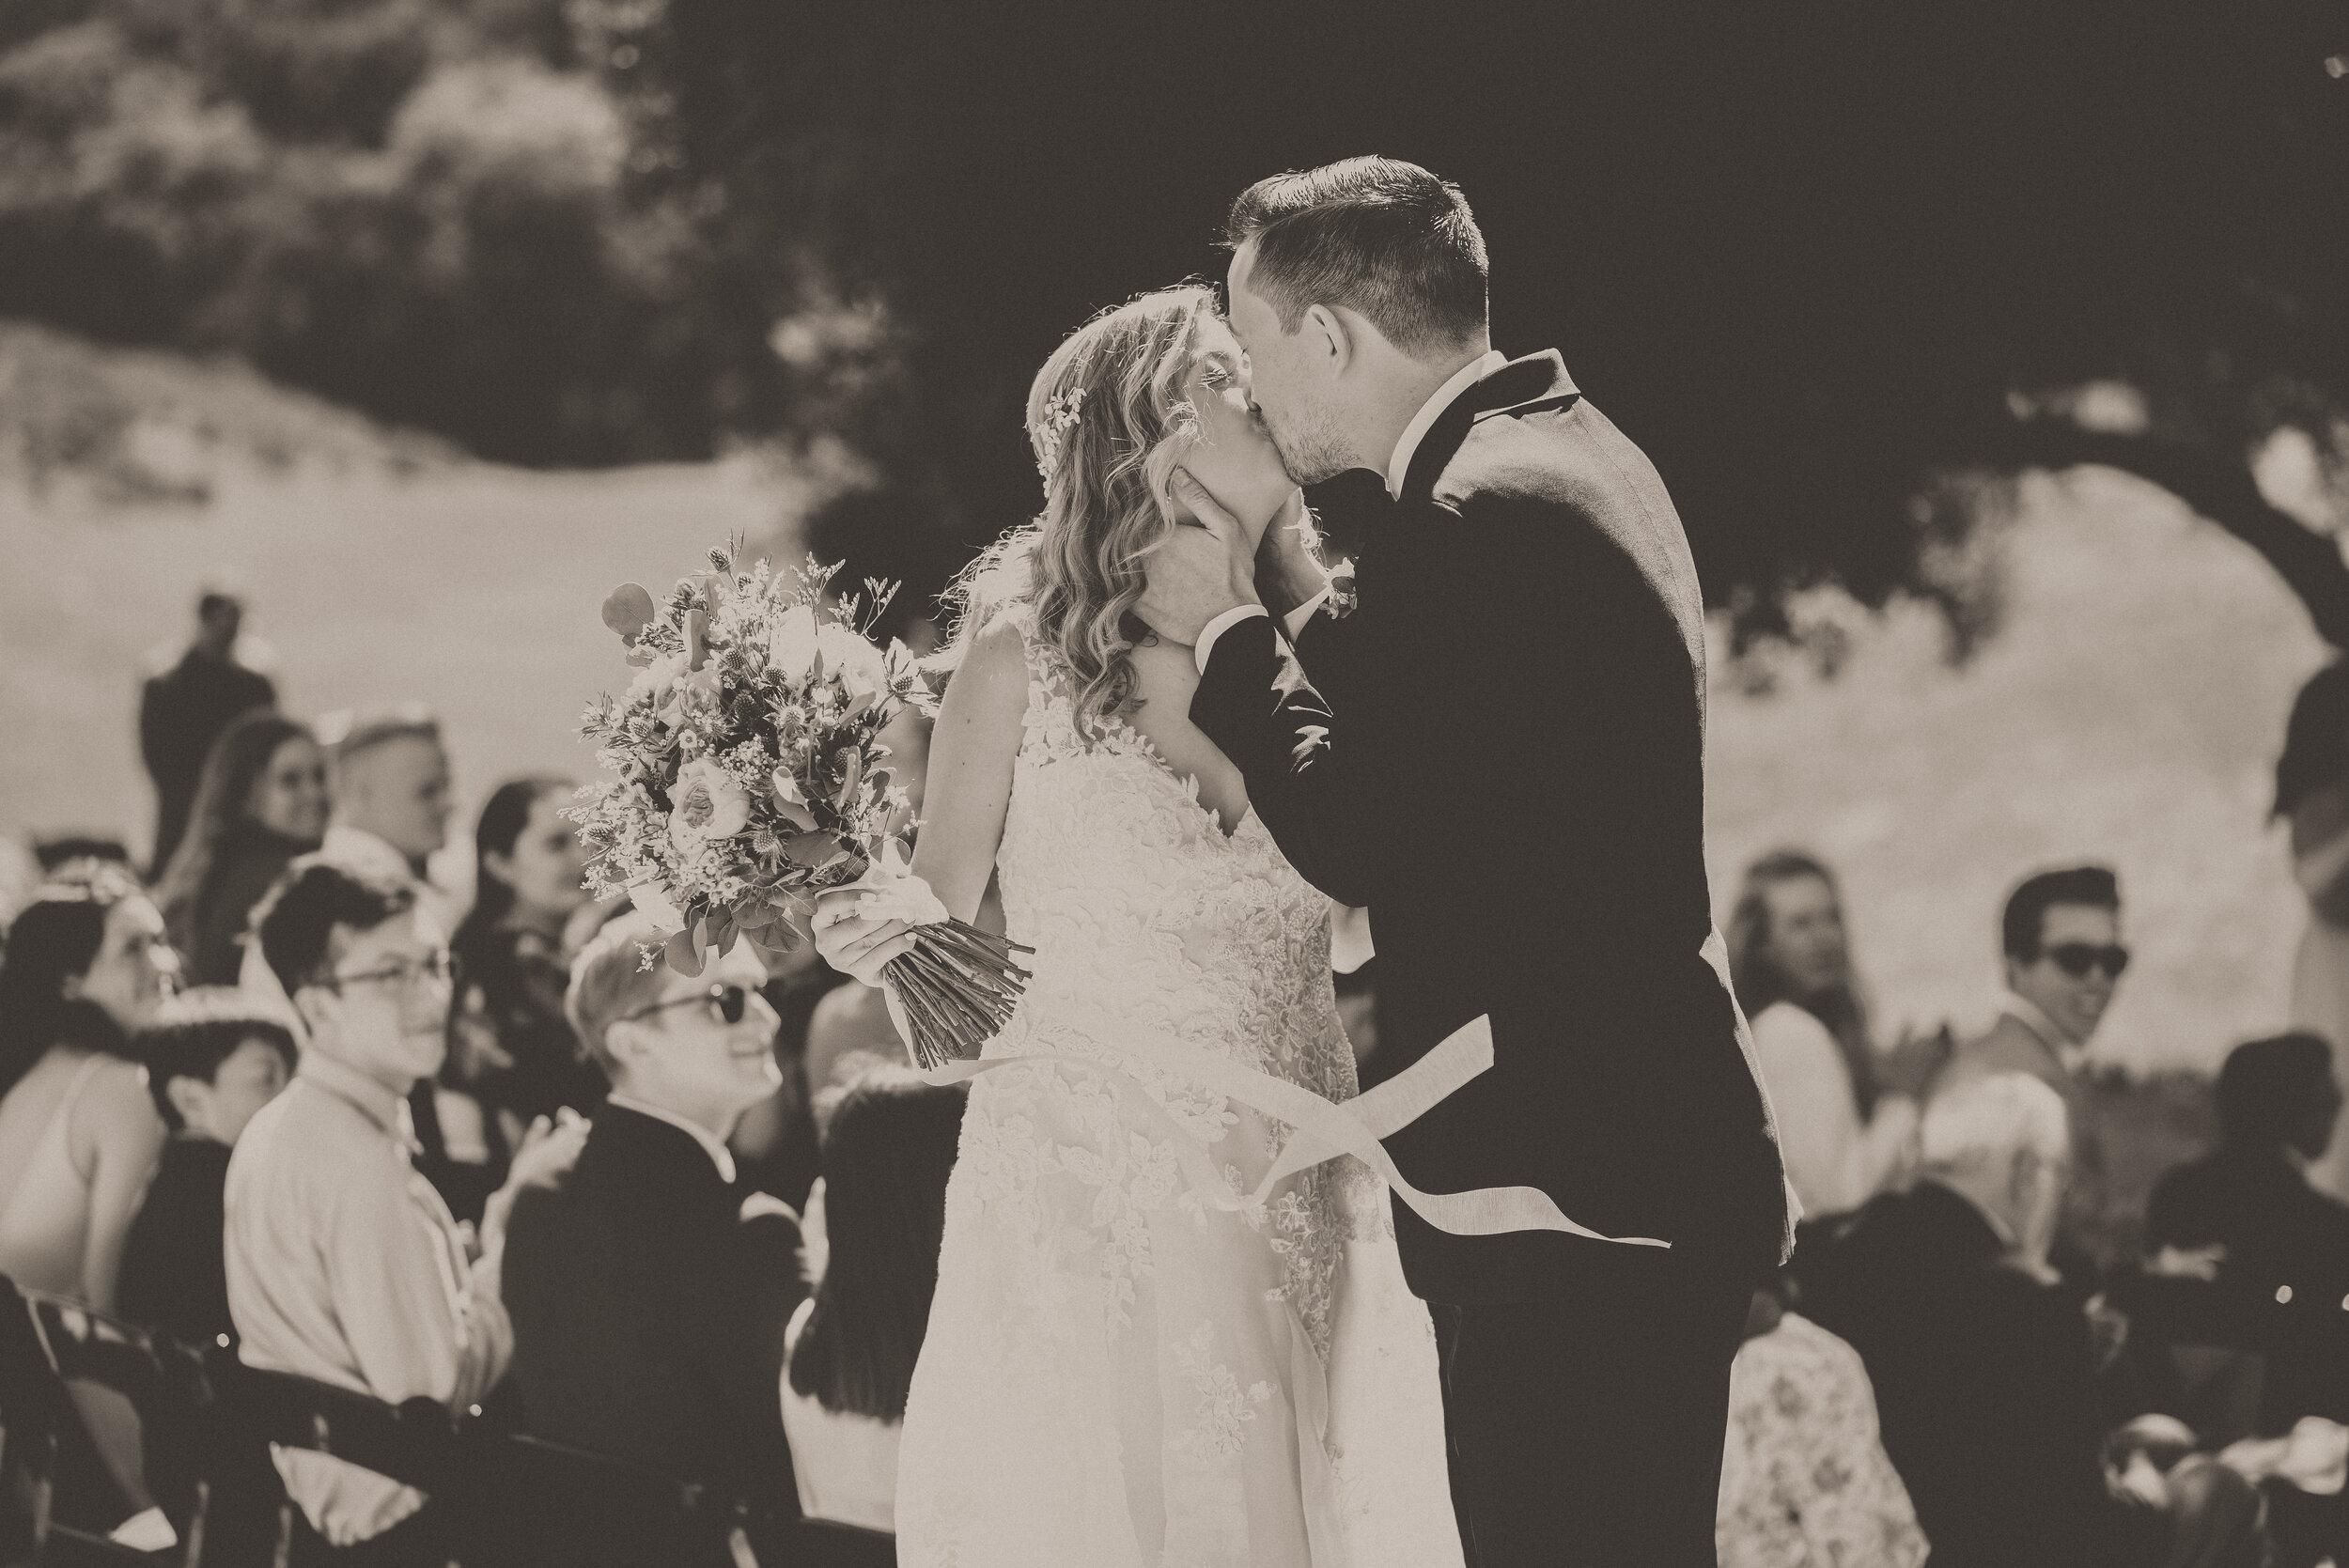 Kyle & Ariana - Ceremony-64.jpg